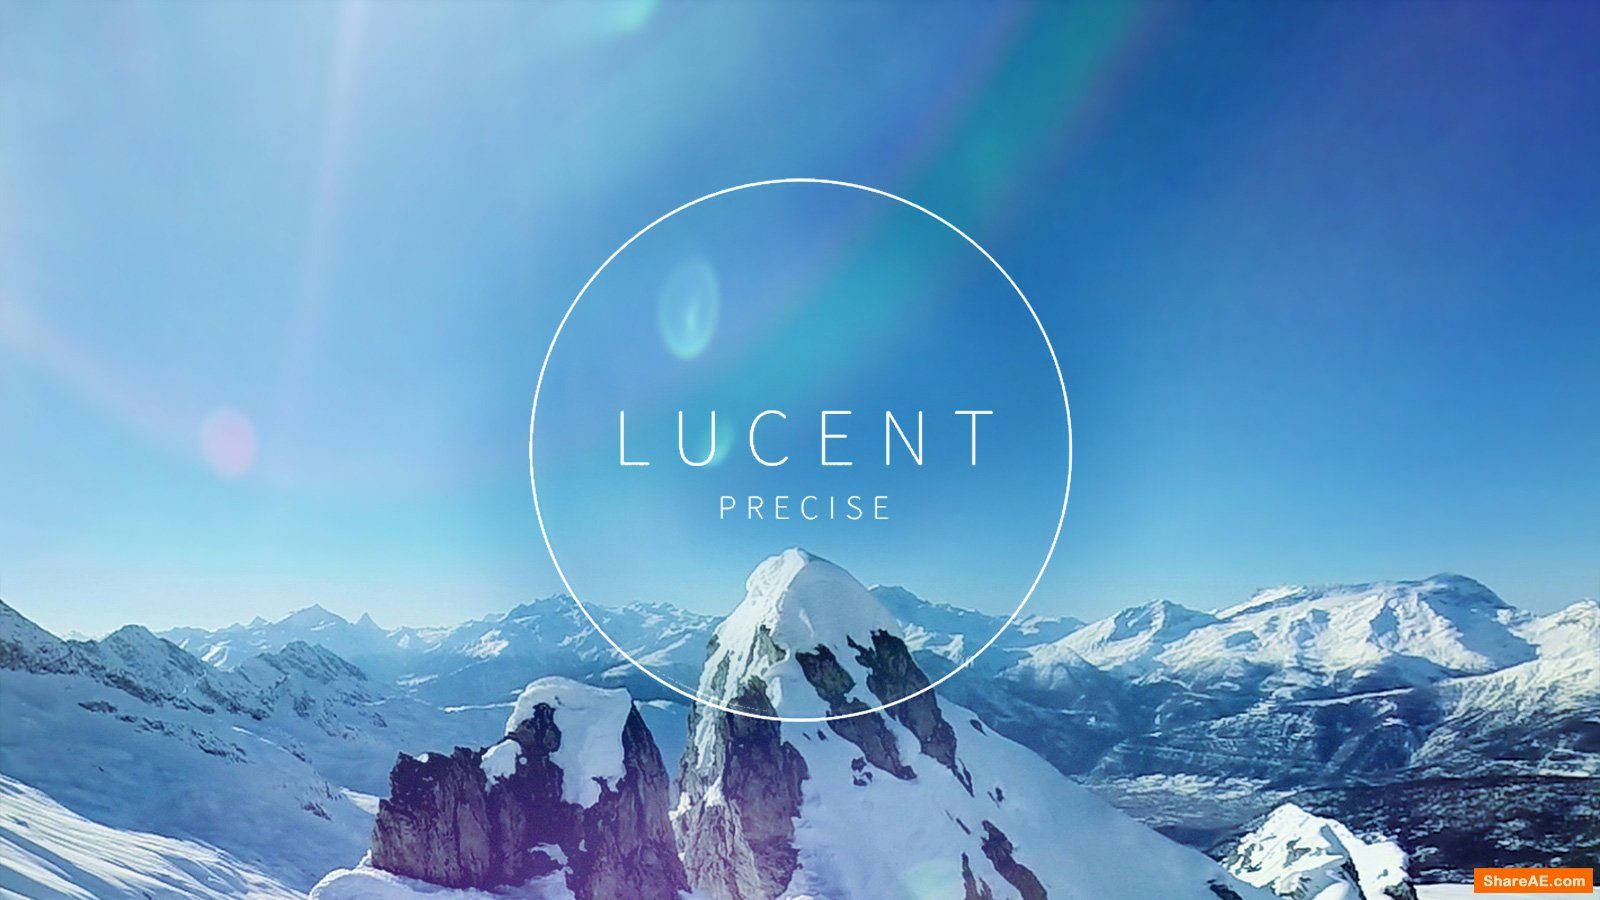 Lucent Precise: 110 Blue-Hued Lens Flares (RocketStock)